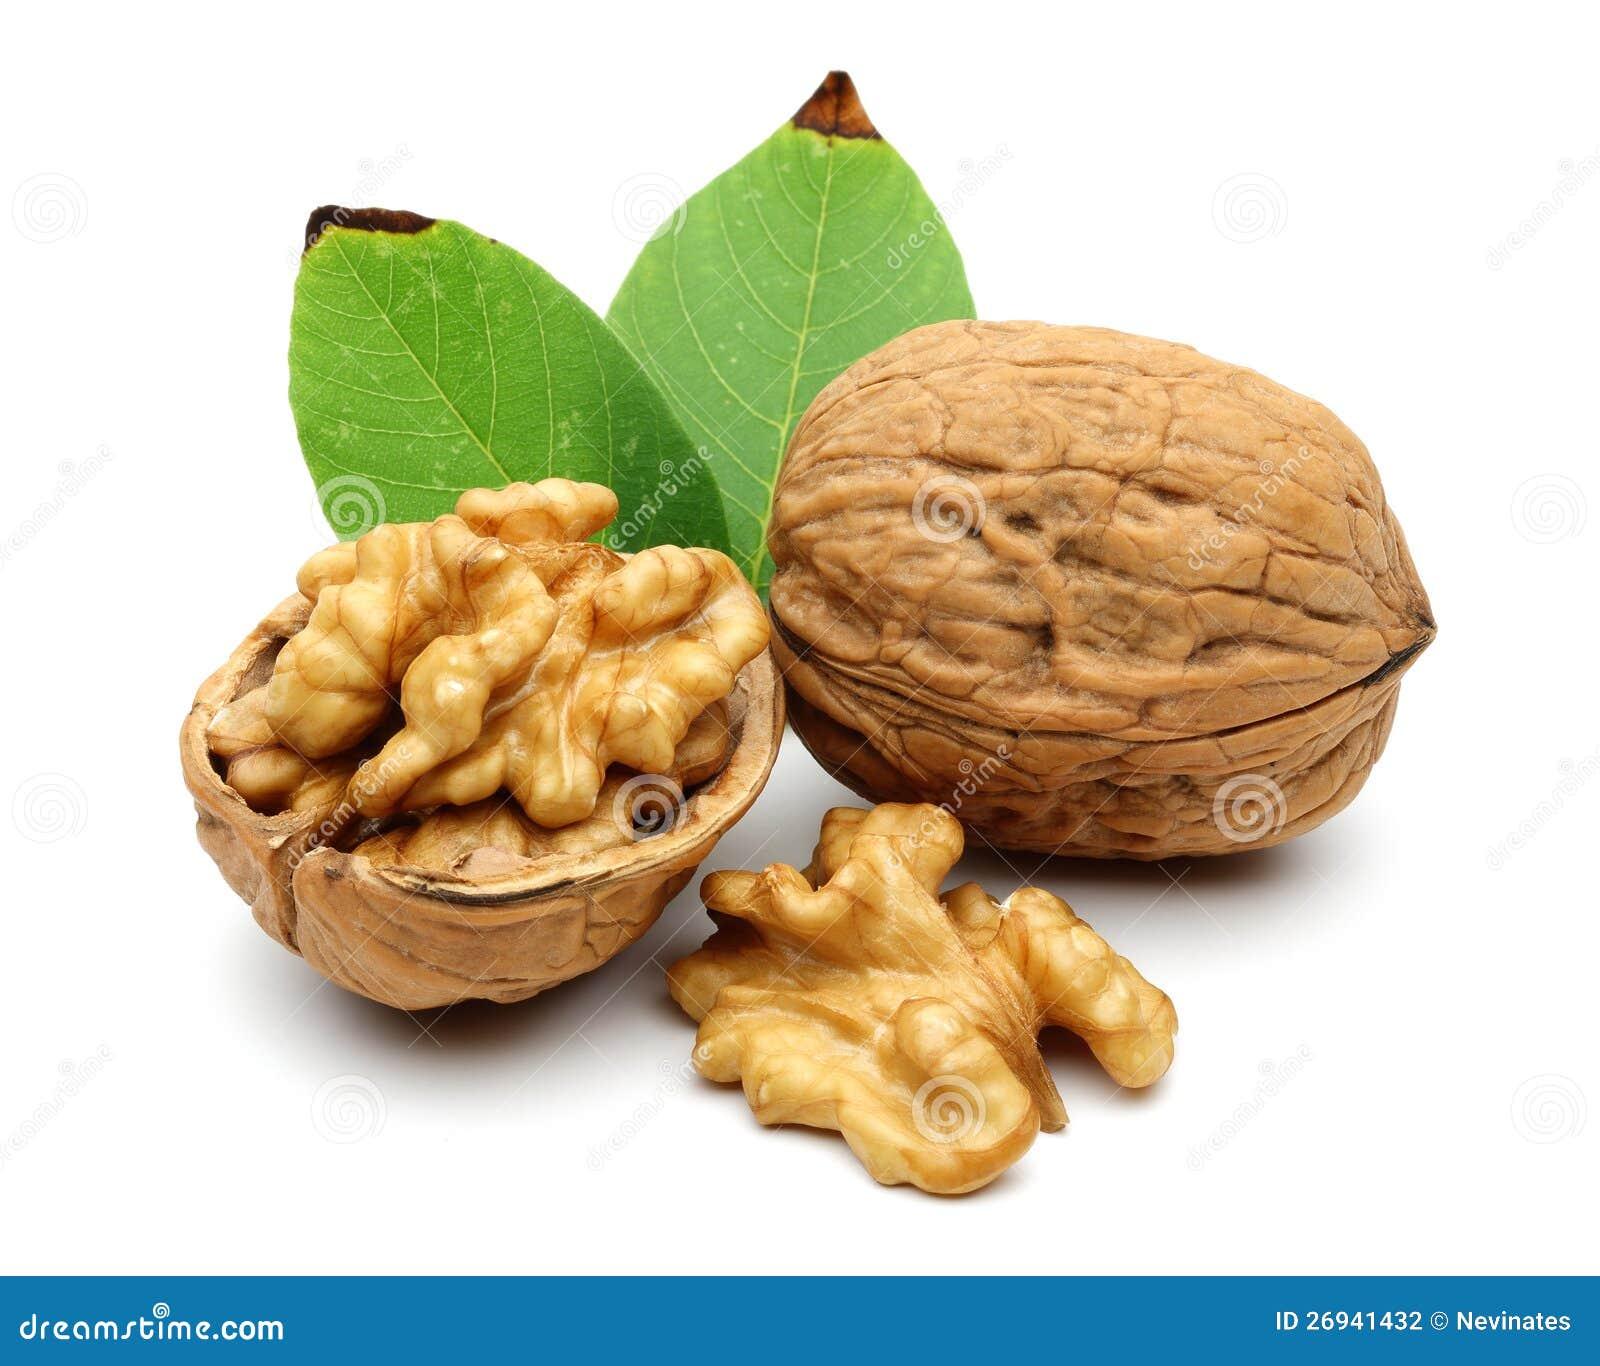 Орехи похожие на грецкие